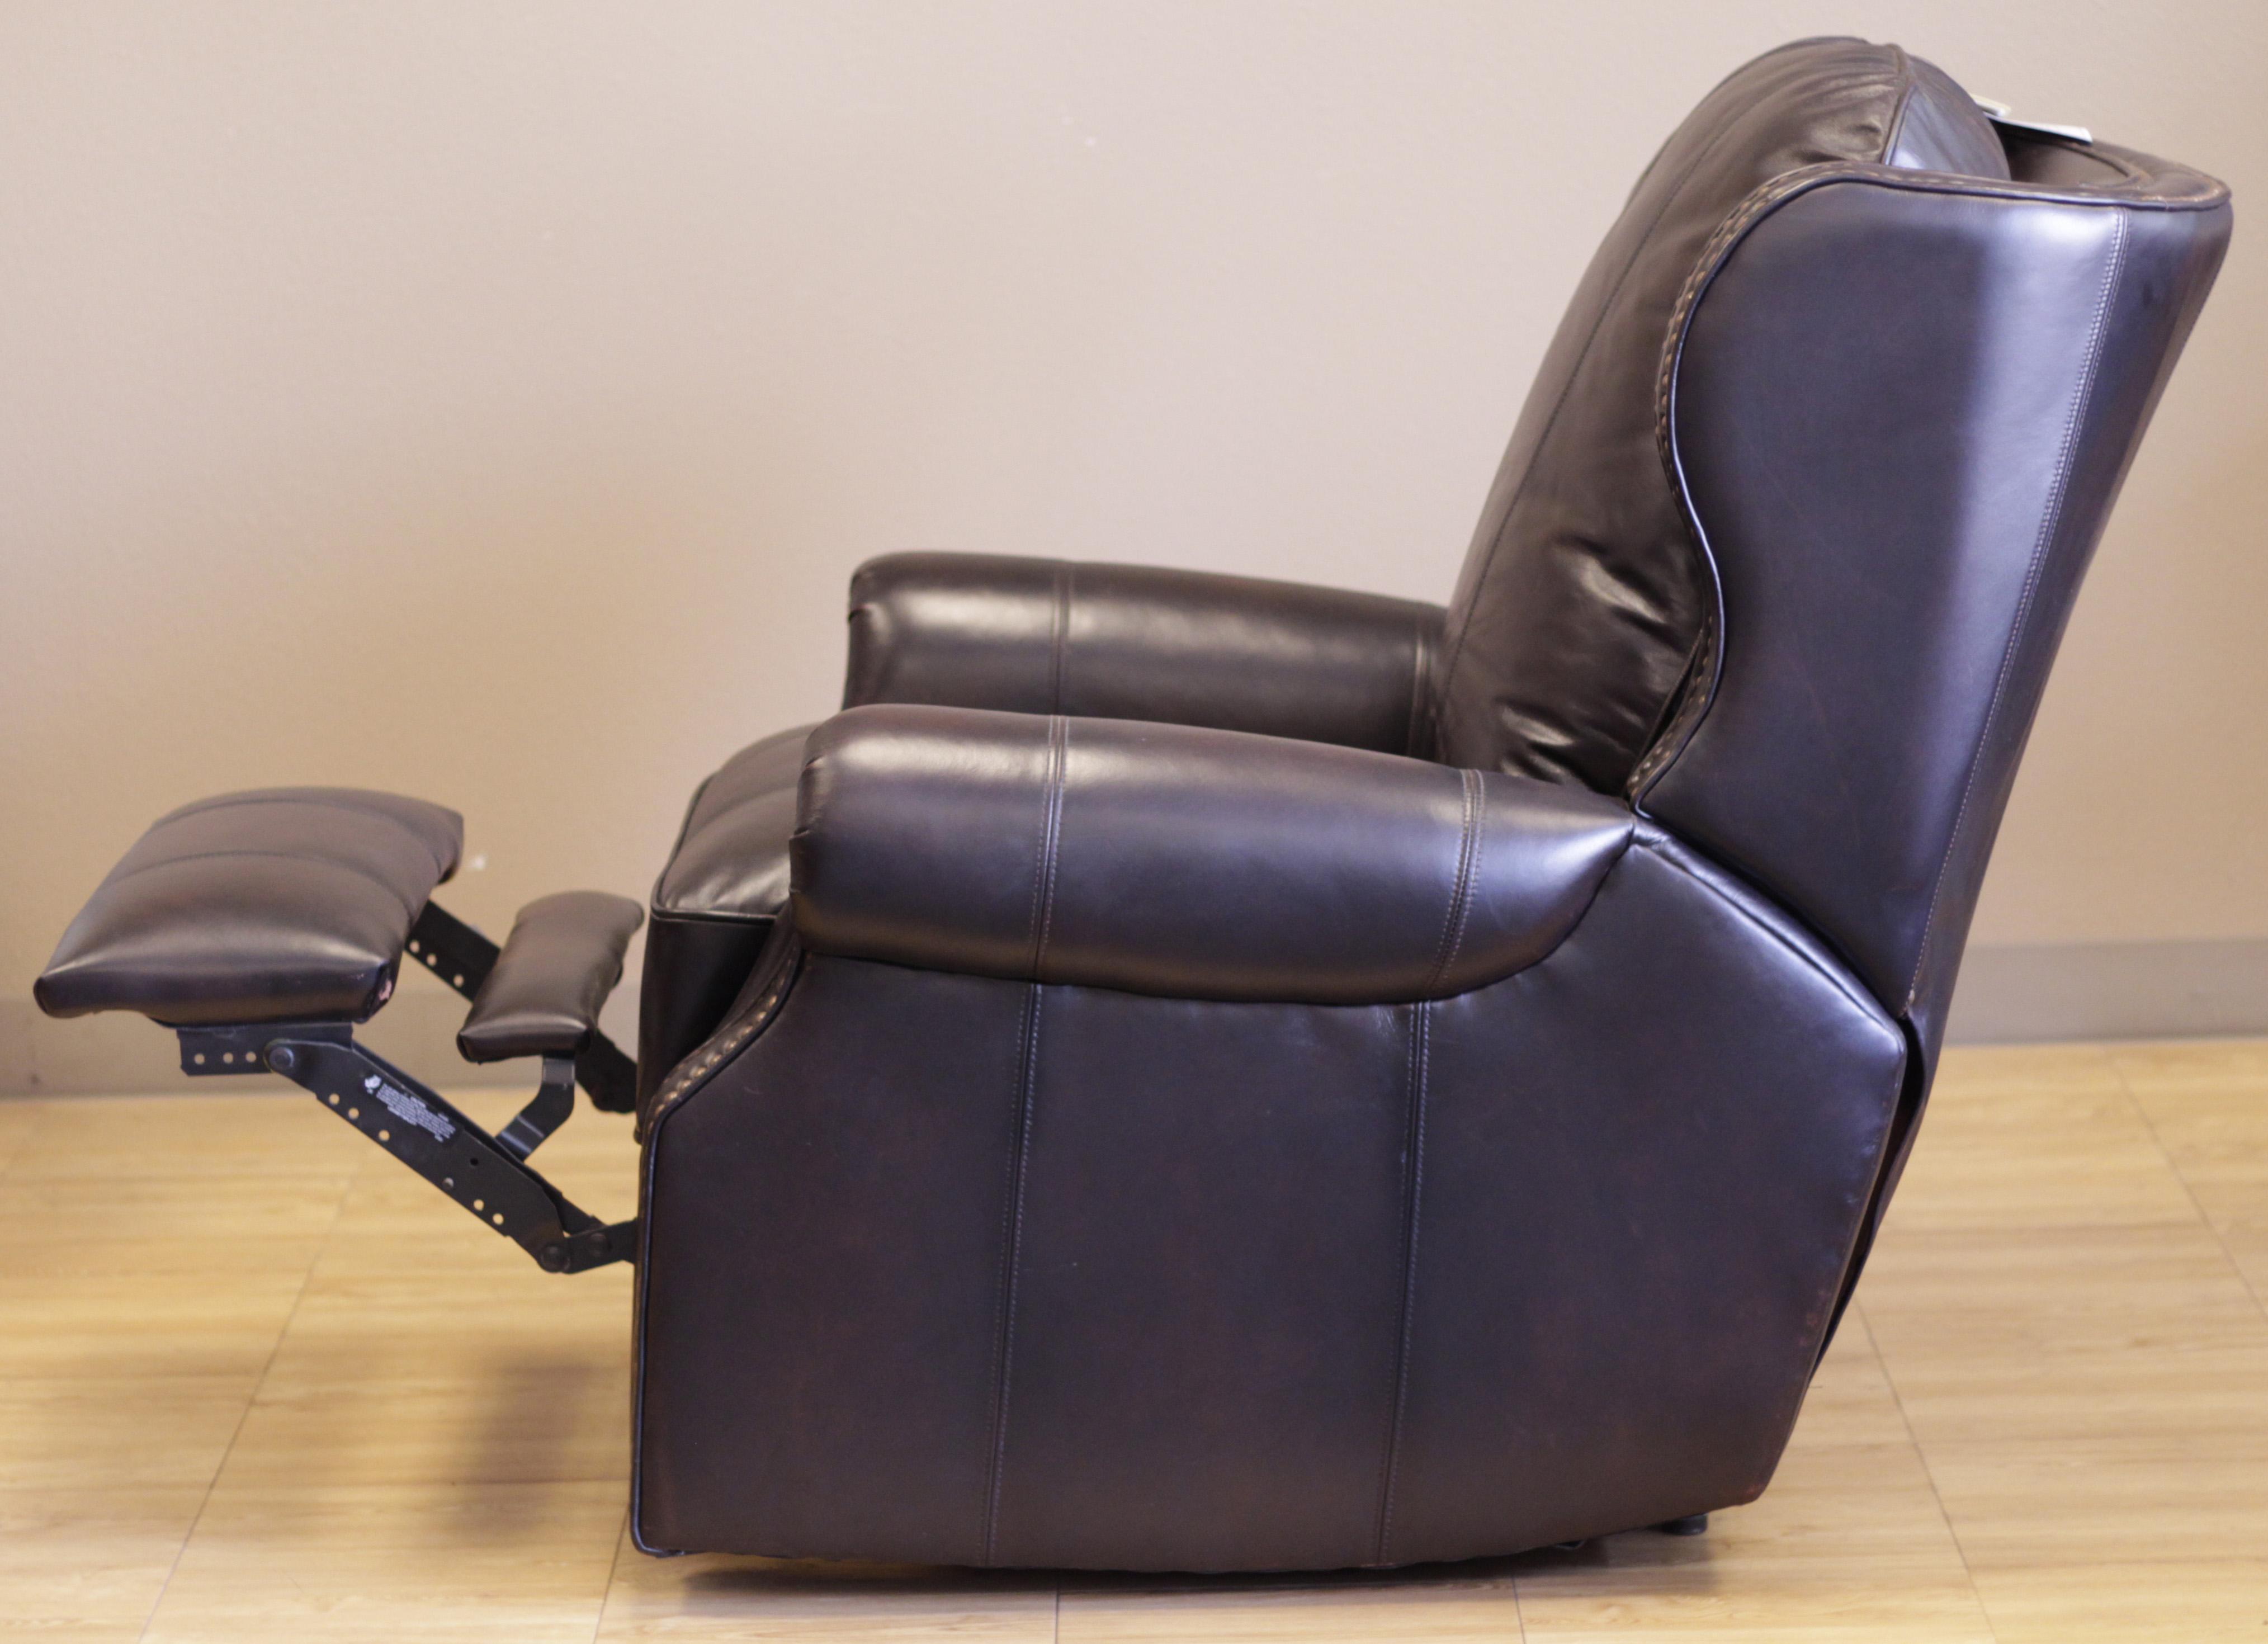 Barcalounger Recliner Bristol Ii Chair Stetson Bordeaux Top Grain Leather